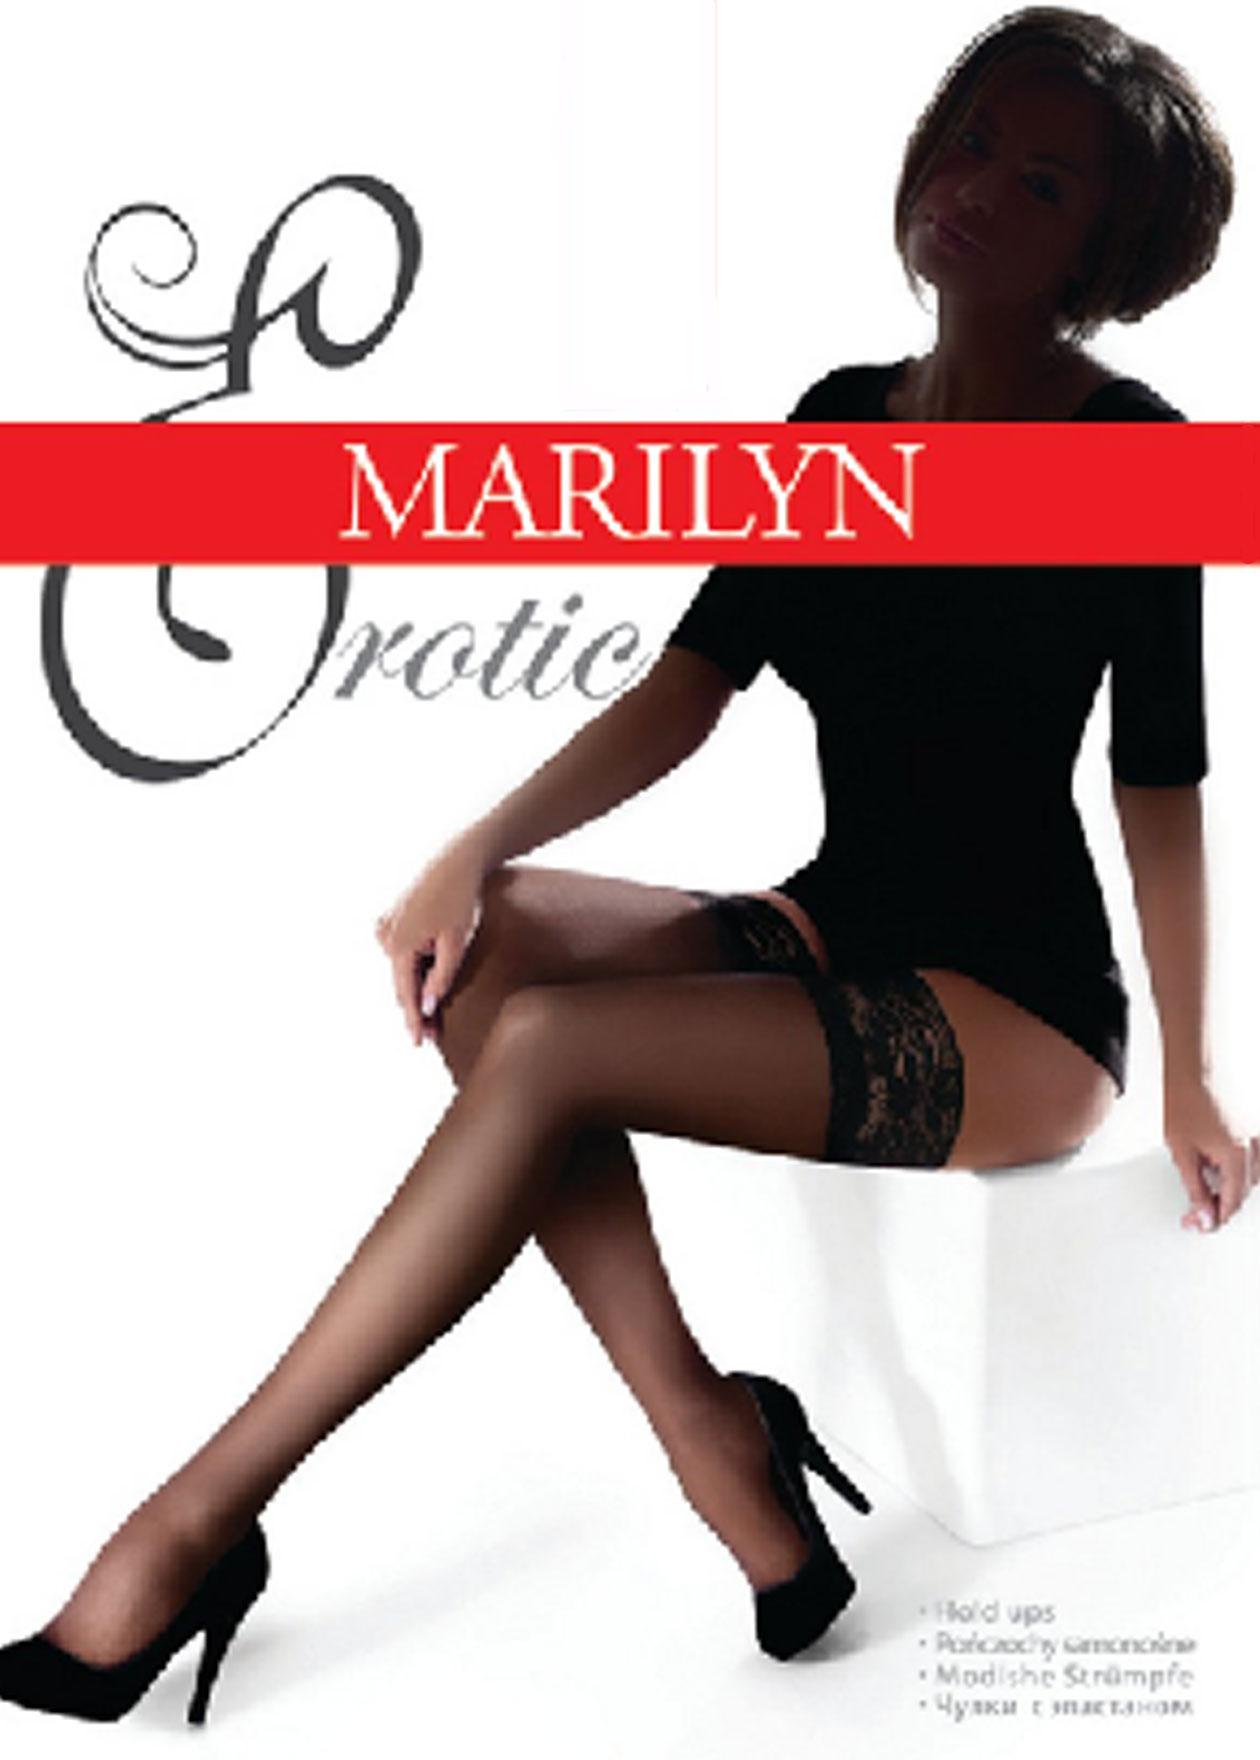 Marilyn Erotic 15